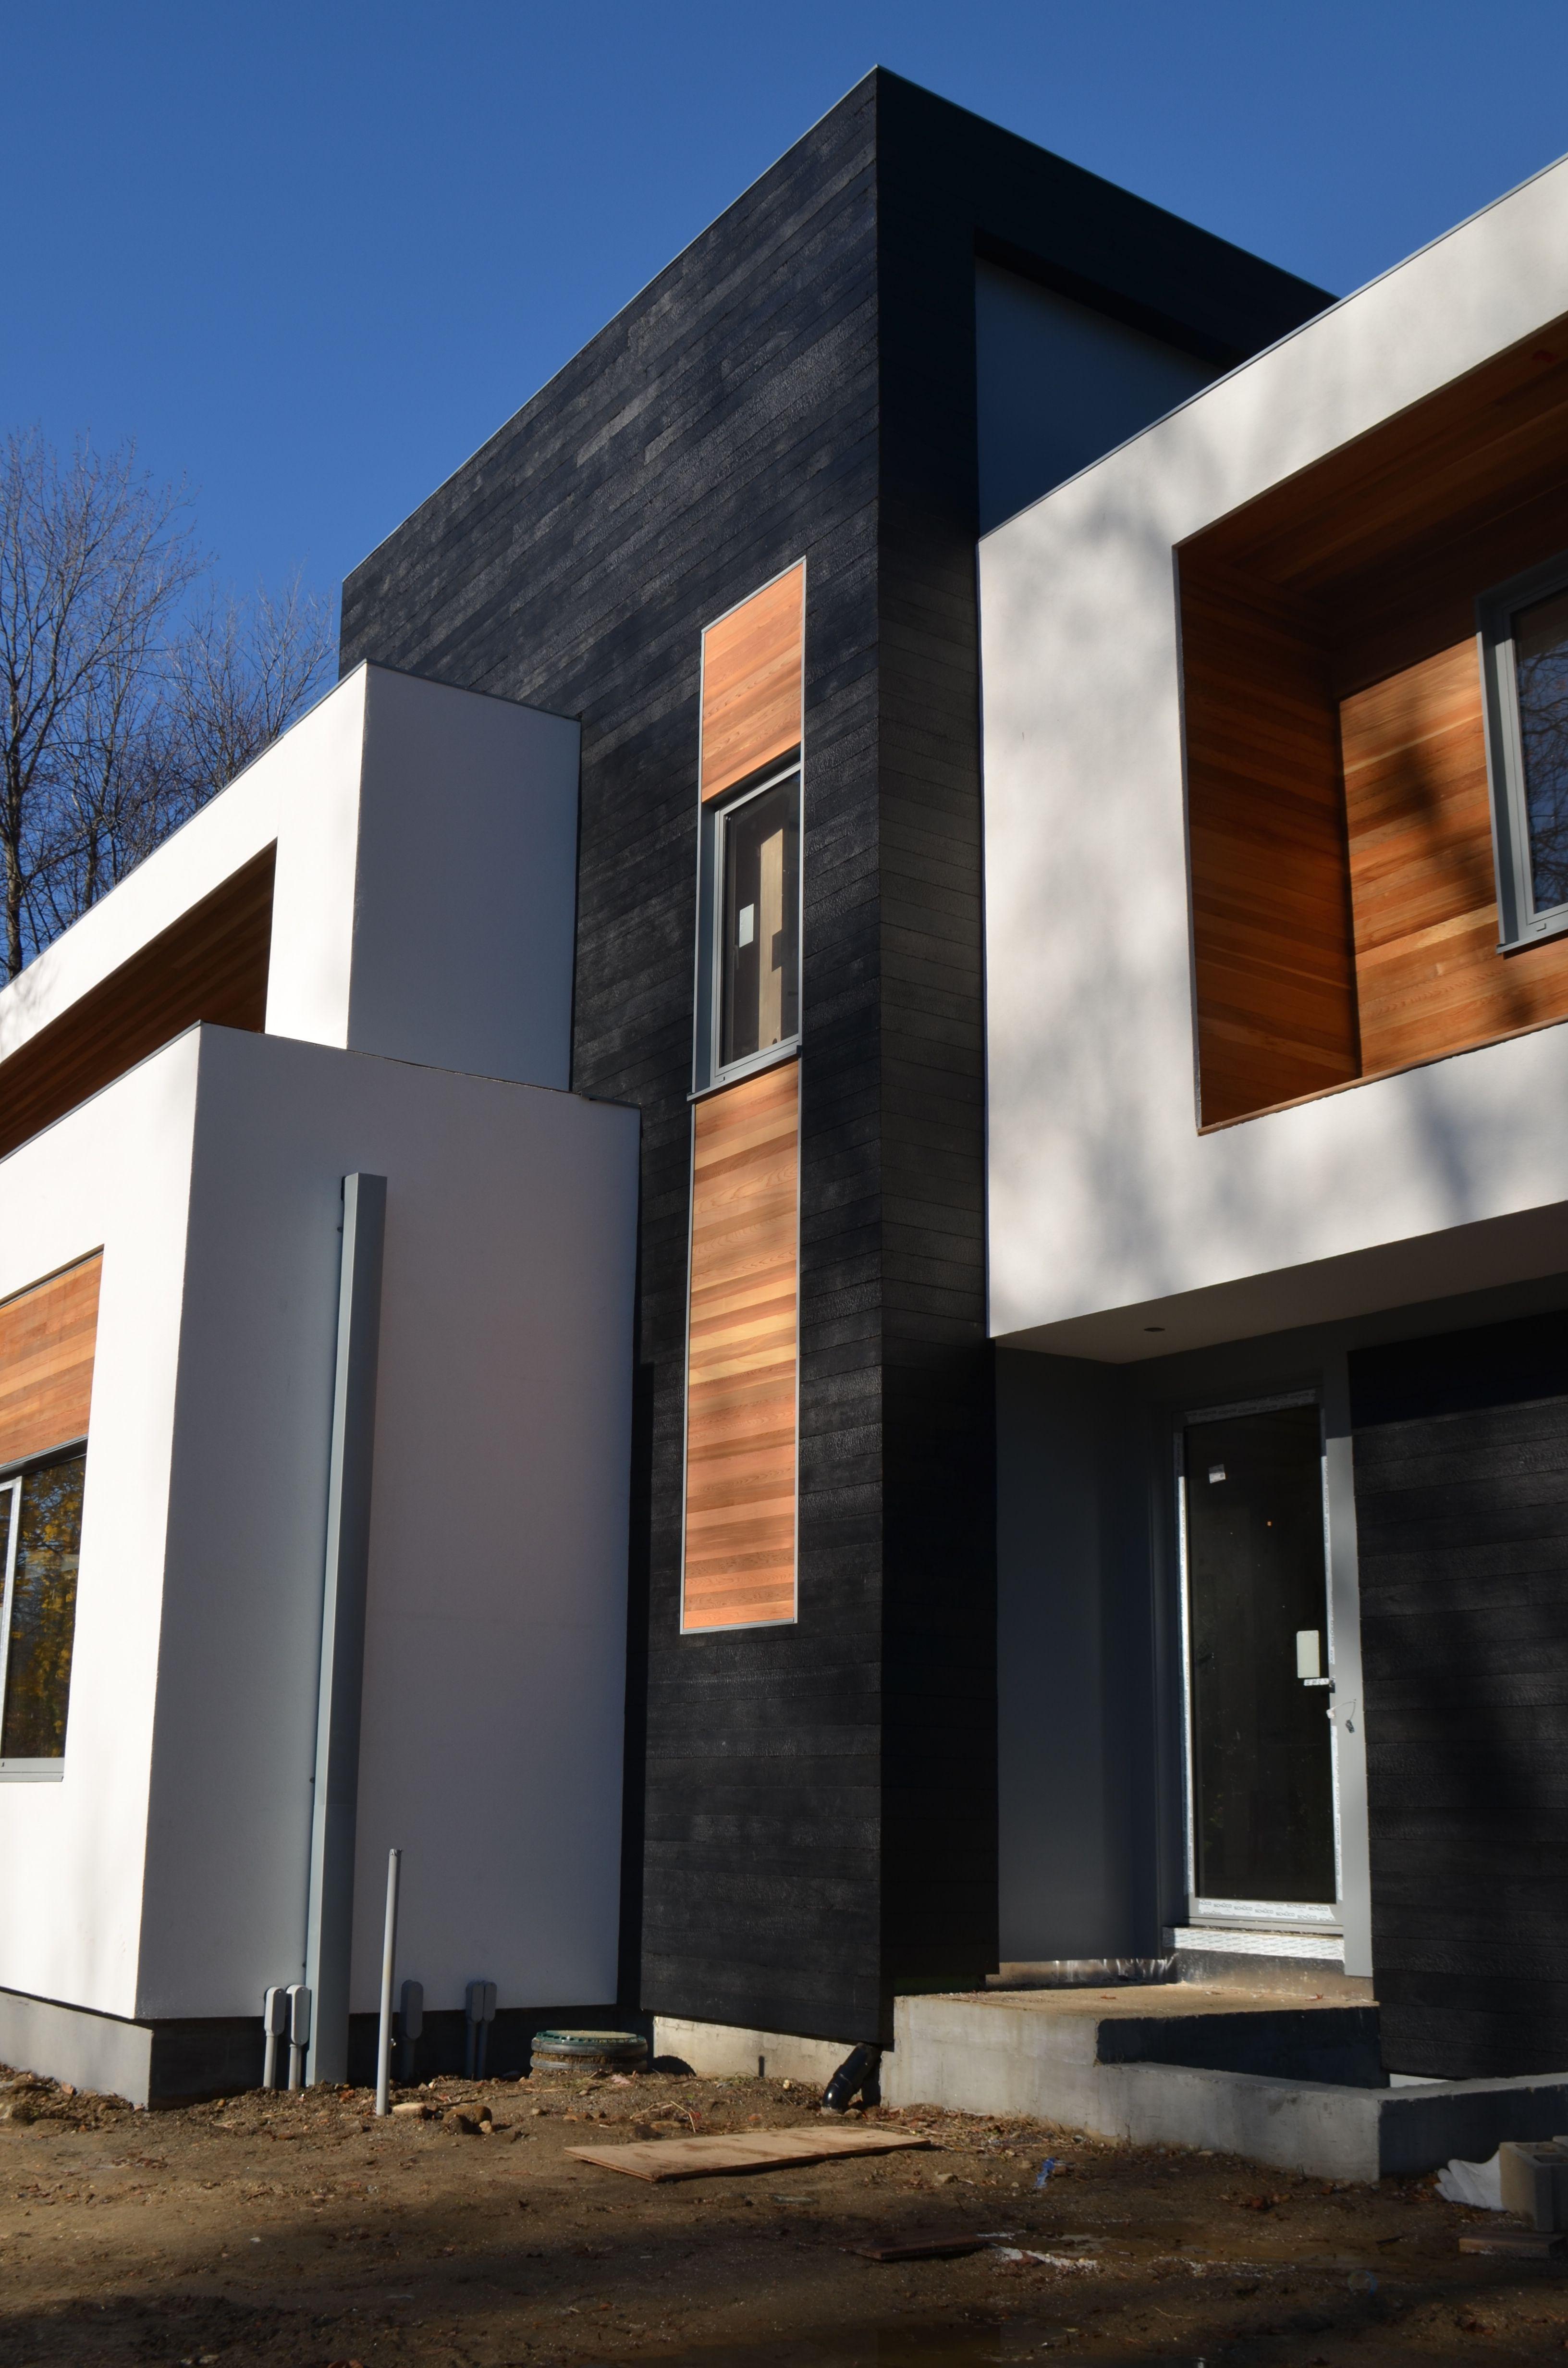 Shou Sugi Ban Exterior House Siding House Cladding House Exterior